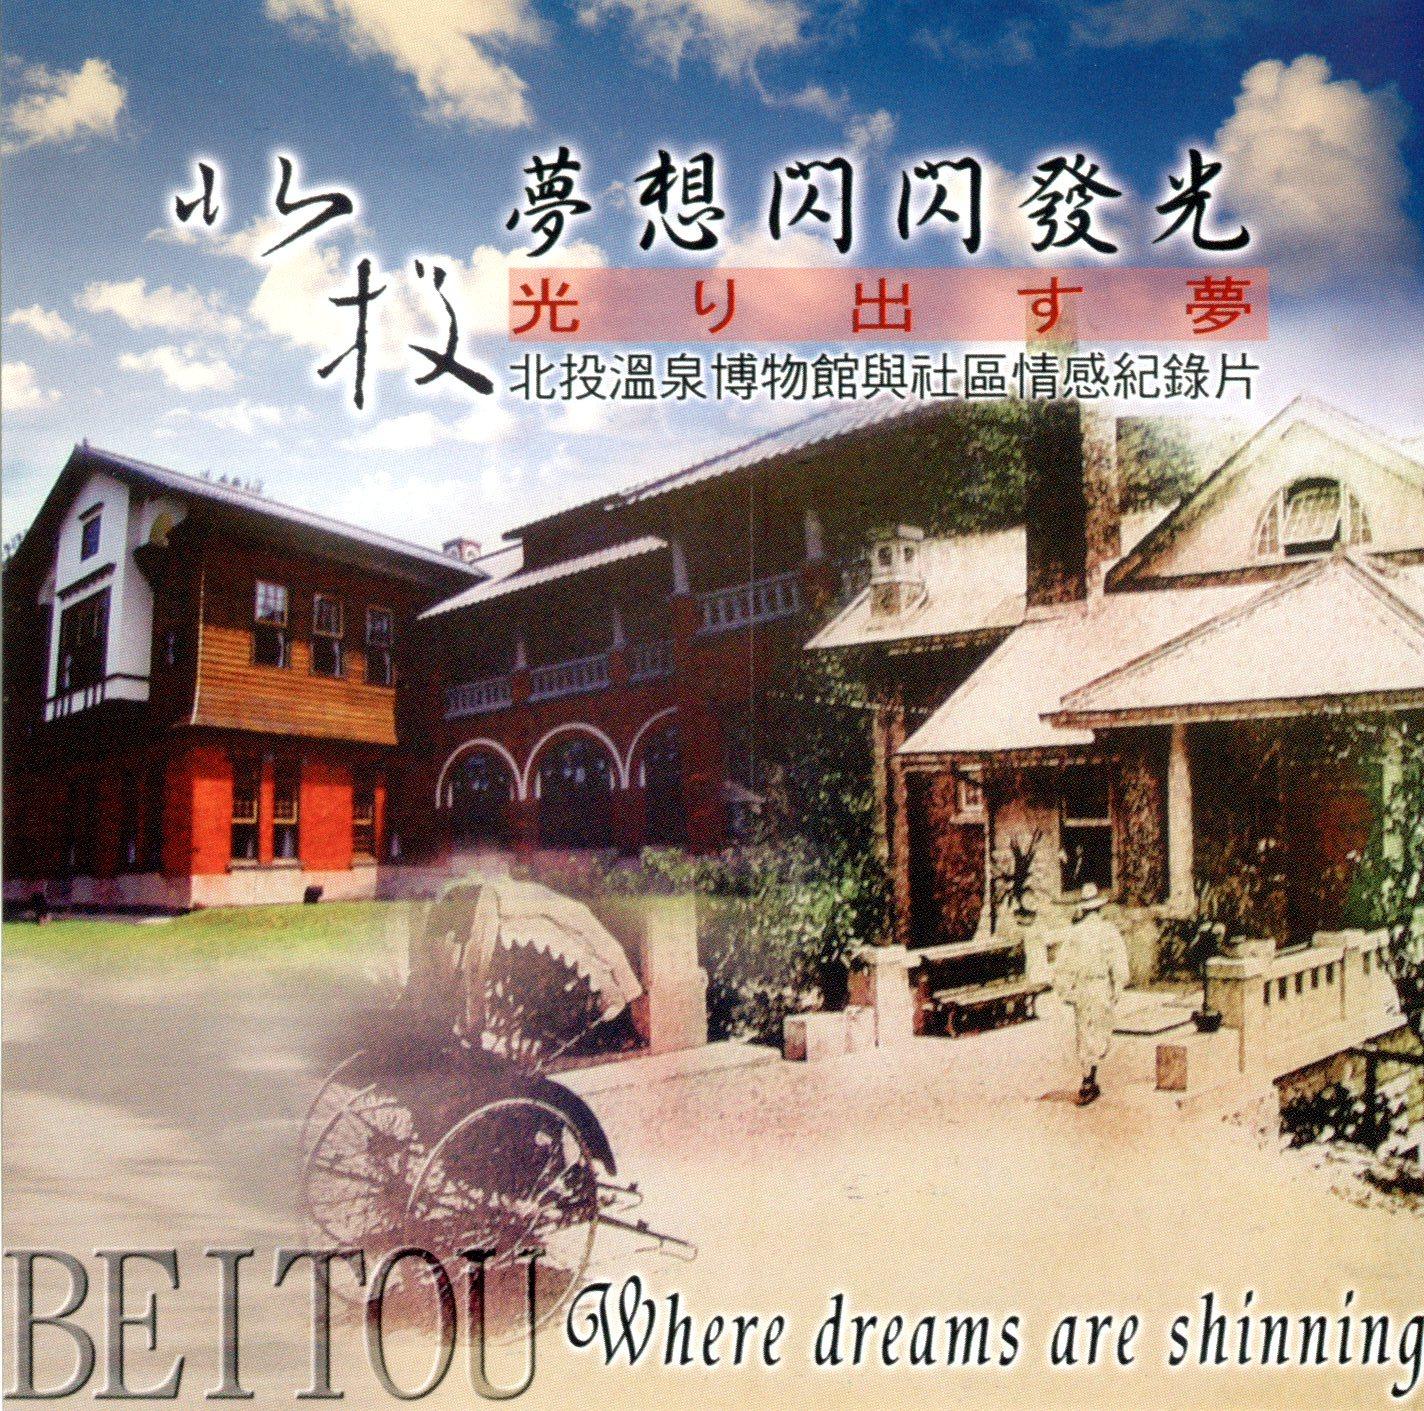 北投夢想閃閃發光 北投溫泉博物館與社區情感紀錄片 = Beitou where dreams are shinning = 光り出す夢 /